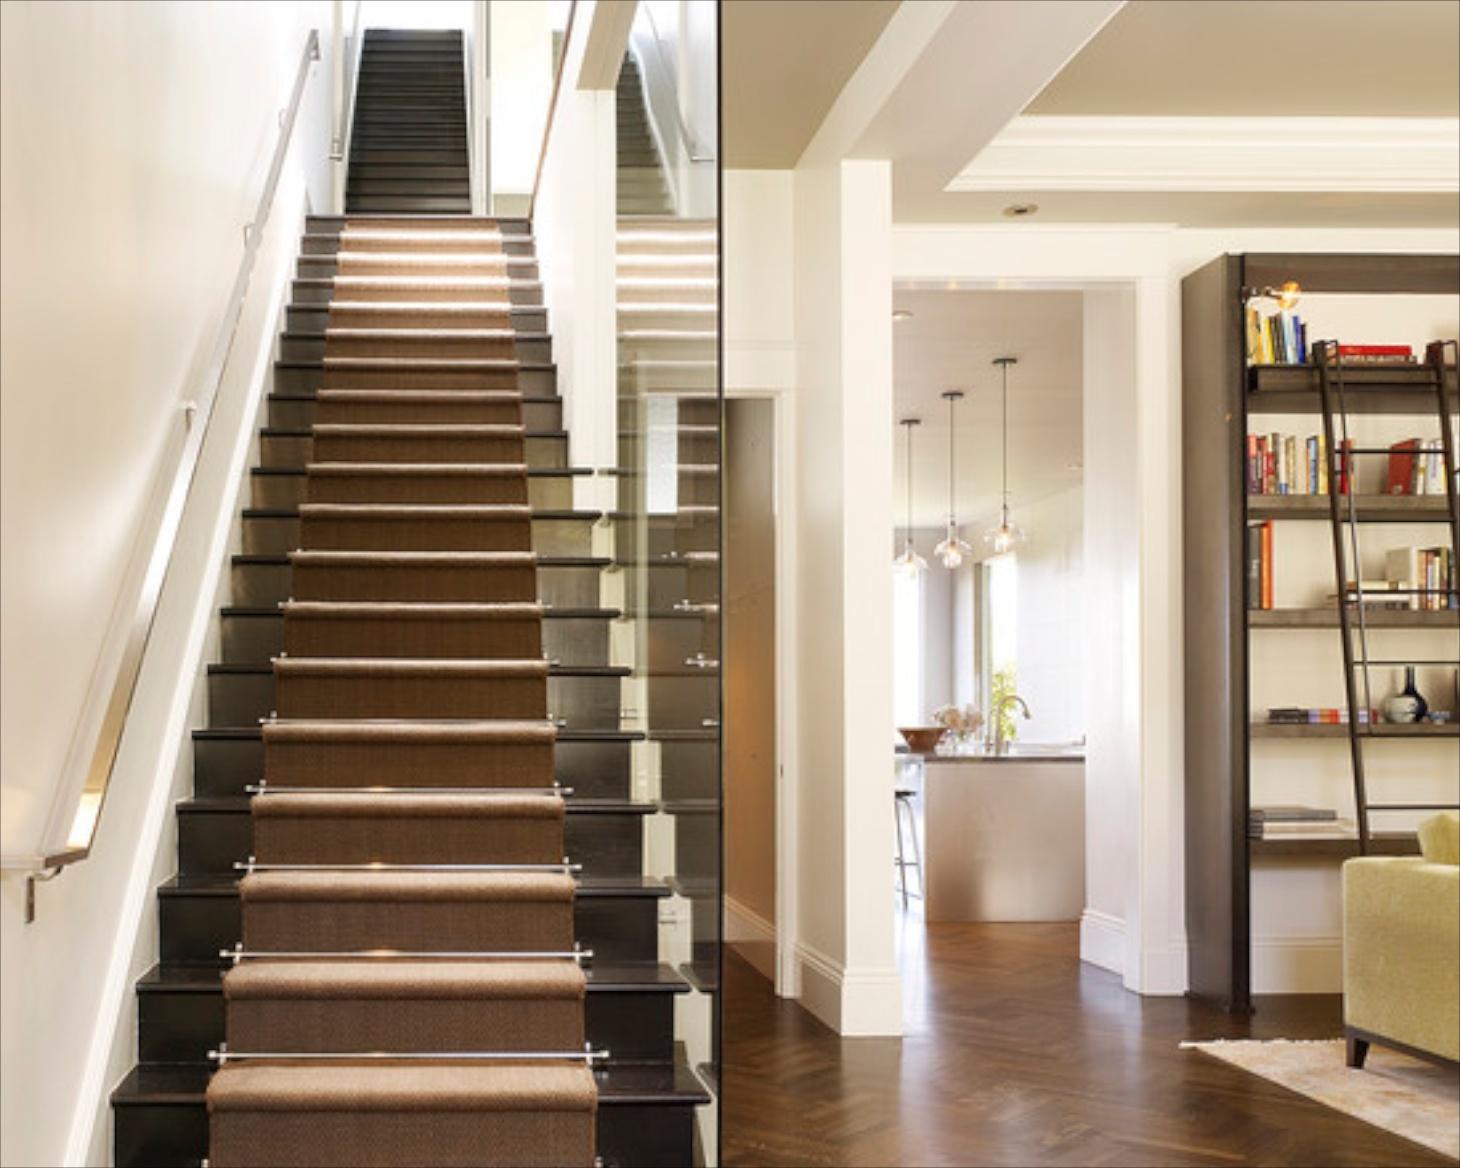 Flooring Stair Treads Carpet Carpet Tread Carpet Treads For Intended For Stair Tread Carpet Rods (#10 of 20)